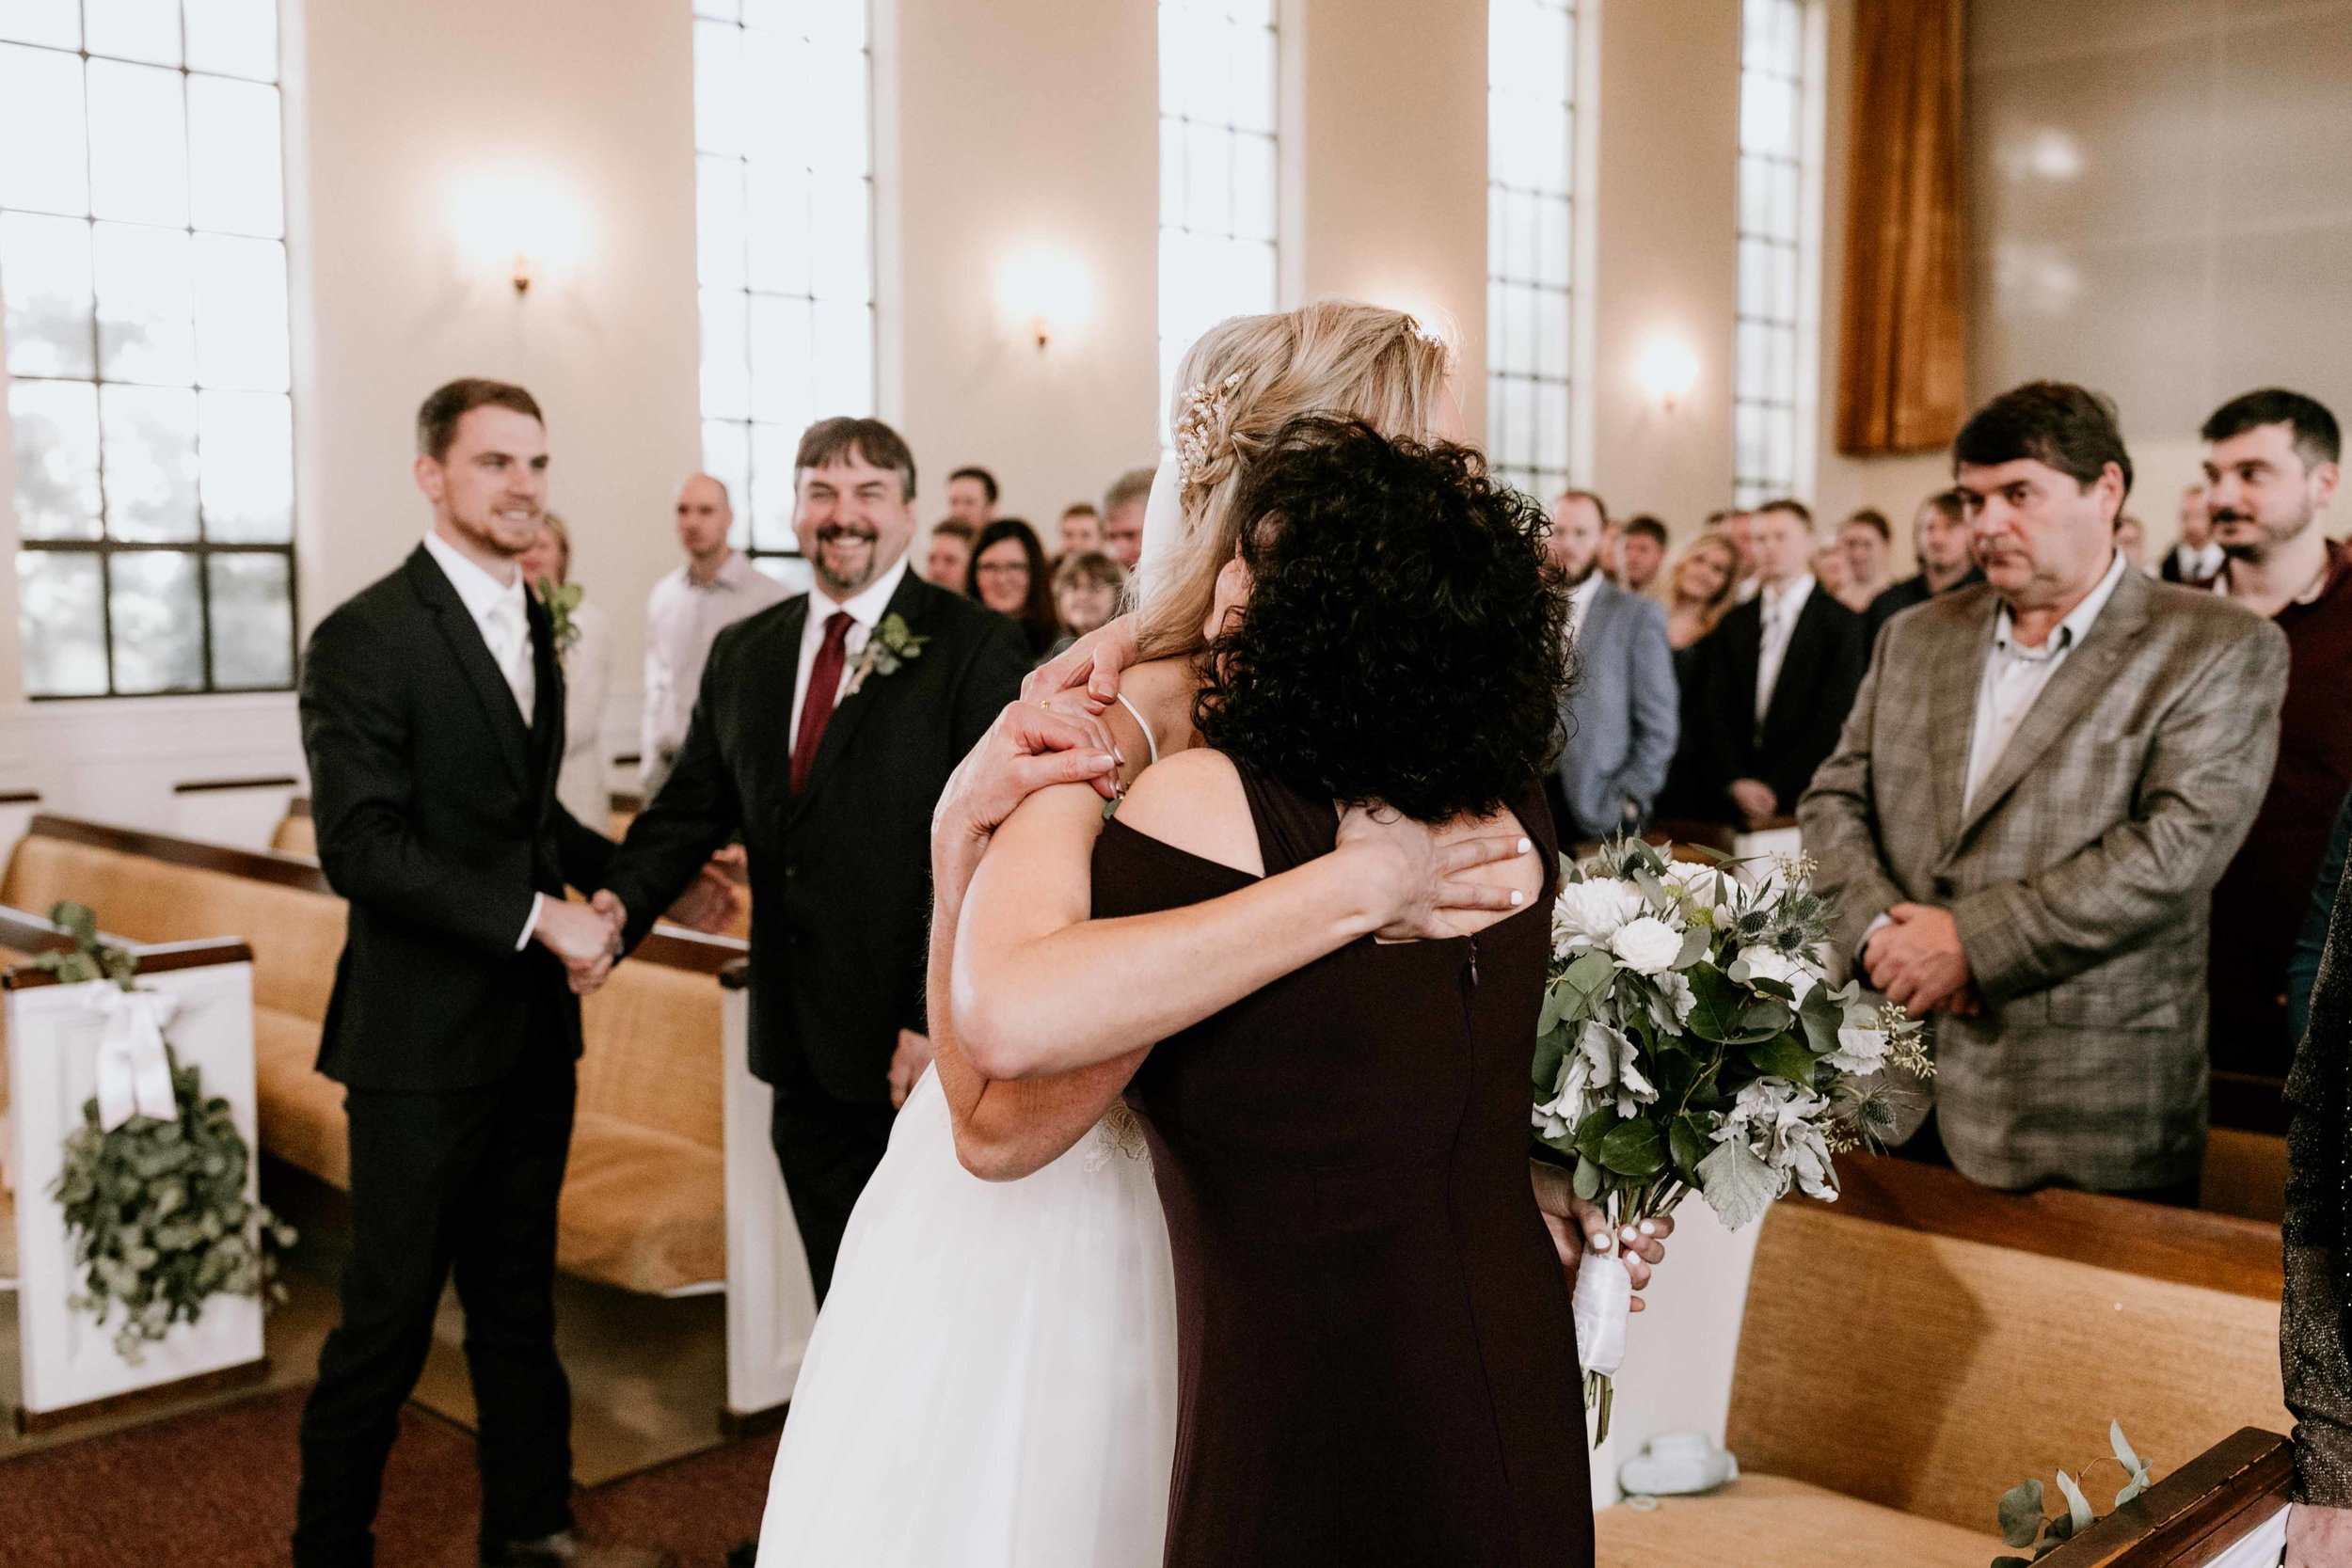 kilworth-memorial-chapel-wedding-63.jpg